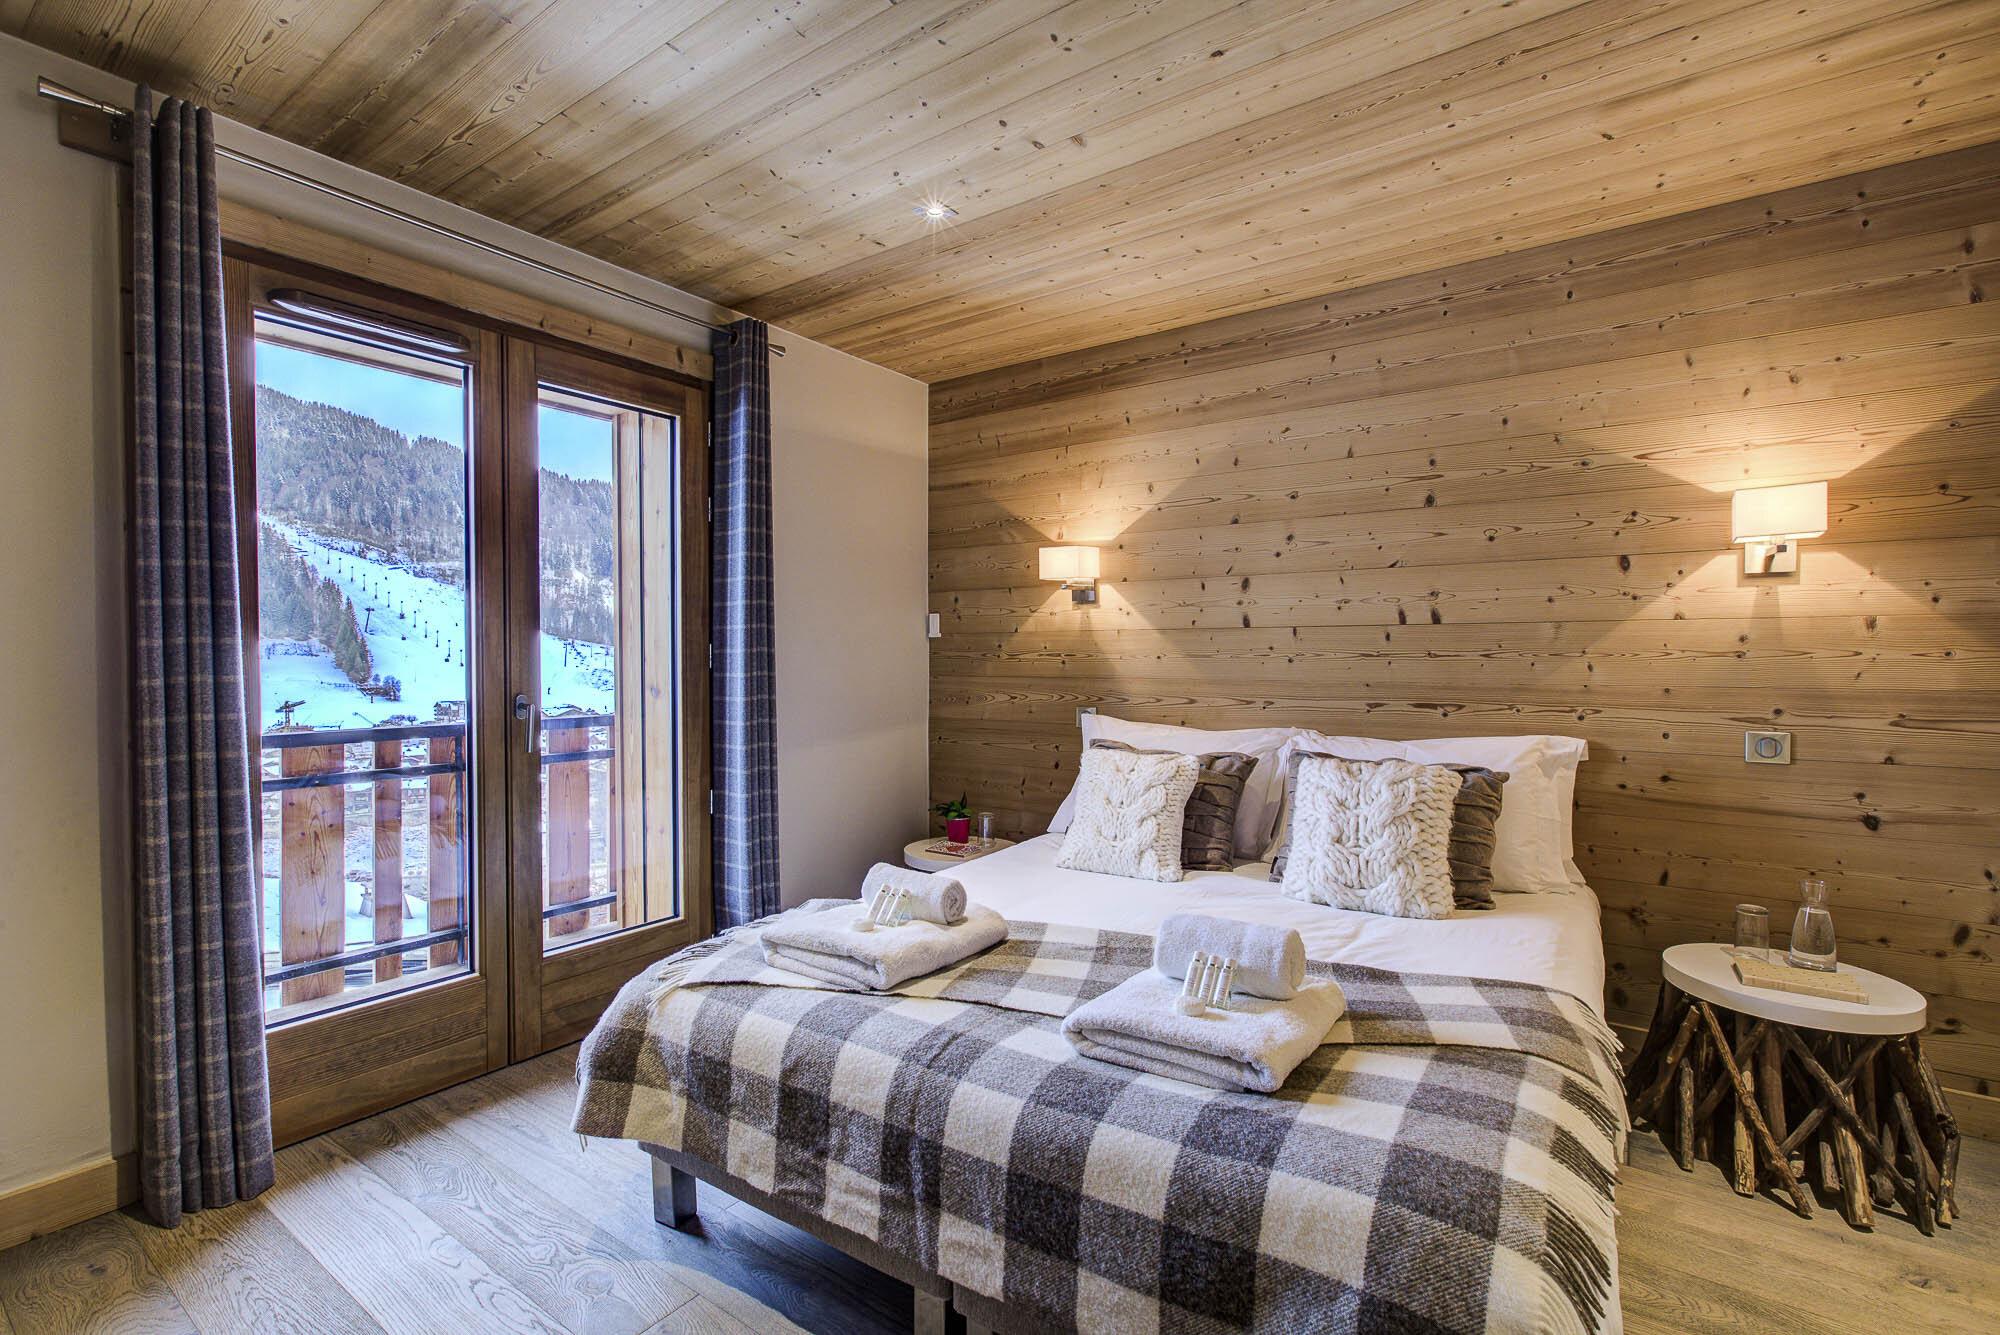 tg-ski-luxury-chalet-les-pierrys-morzine-010.jpg